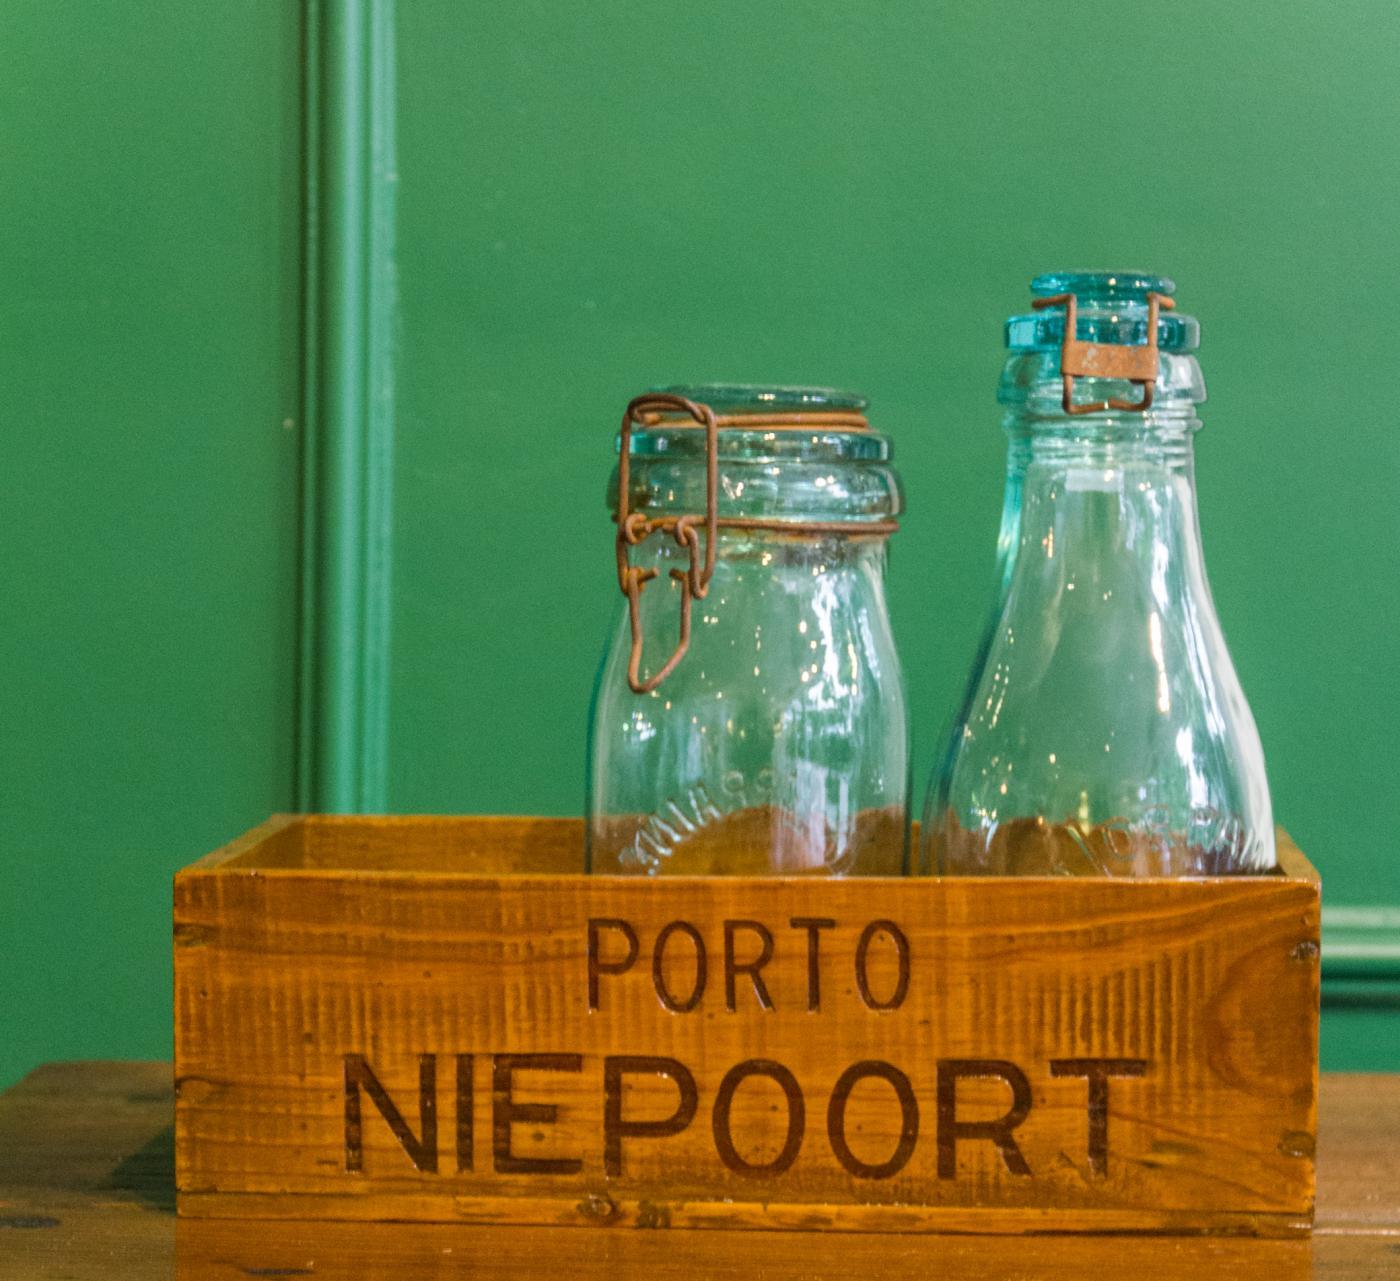 2793-caixa-de-bebidas-portuguesa-adstudio-por-paloma-danemberg-1-1400